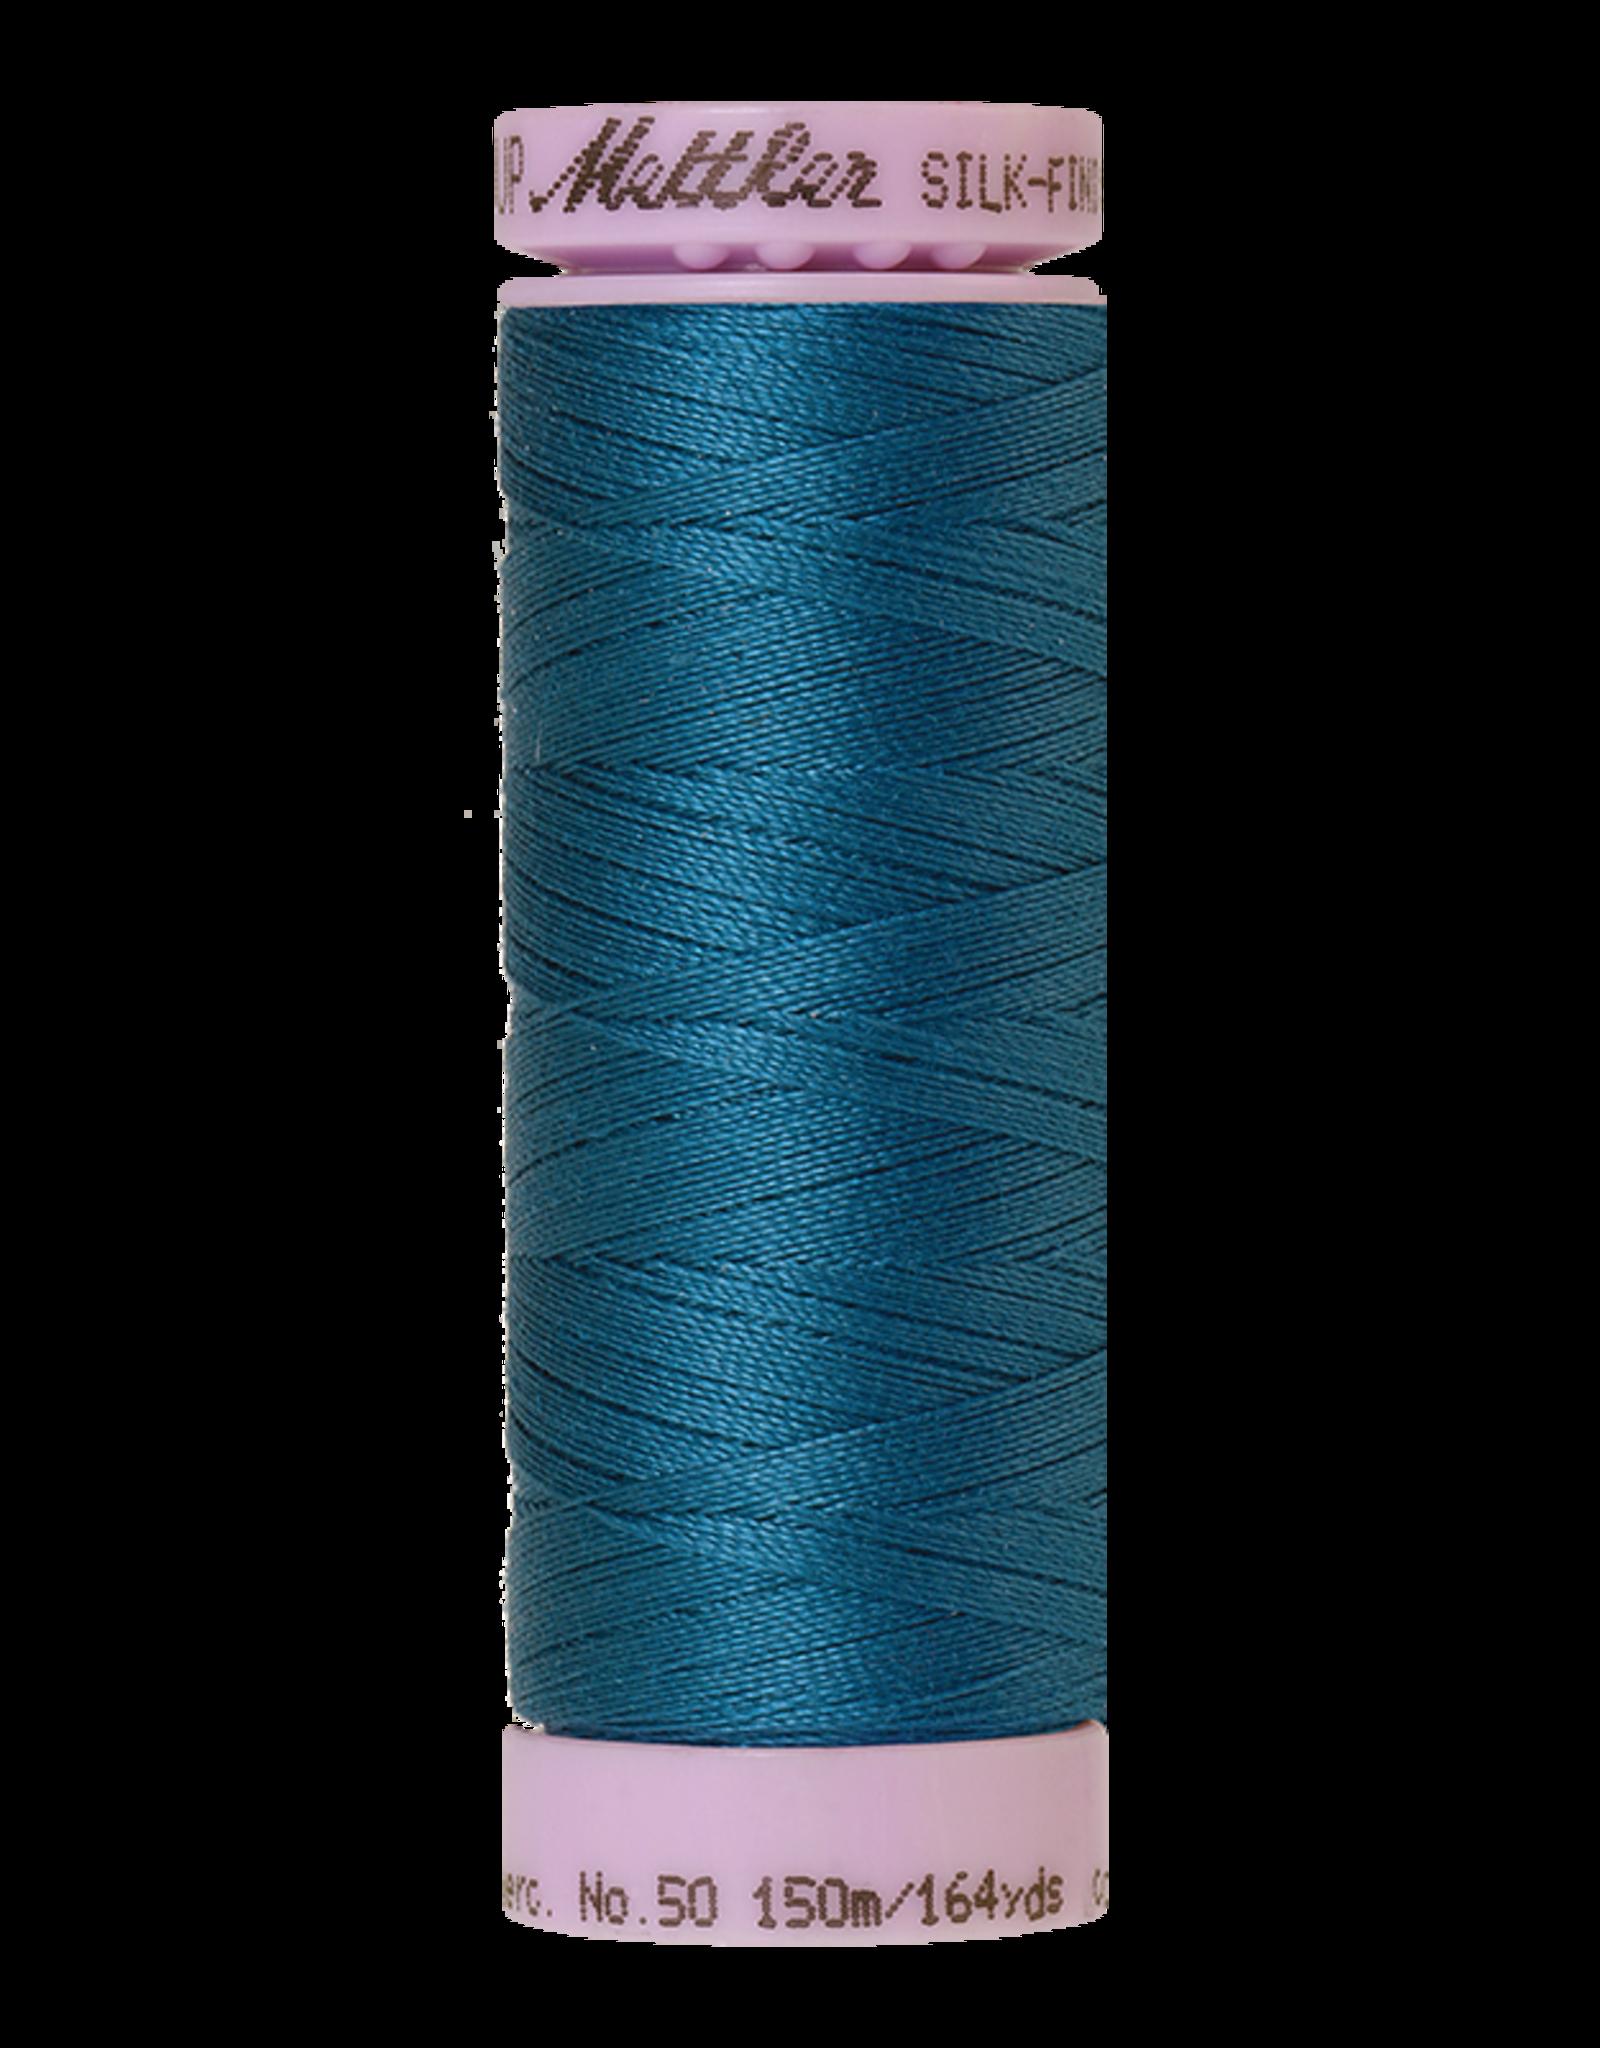 Mettler Silk Finish Cotton 50 - 150 meter - 0483